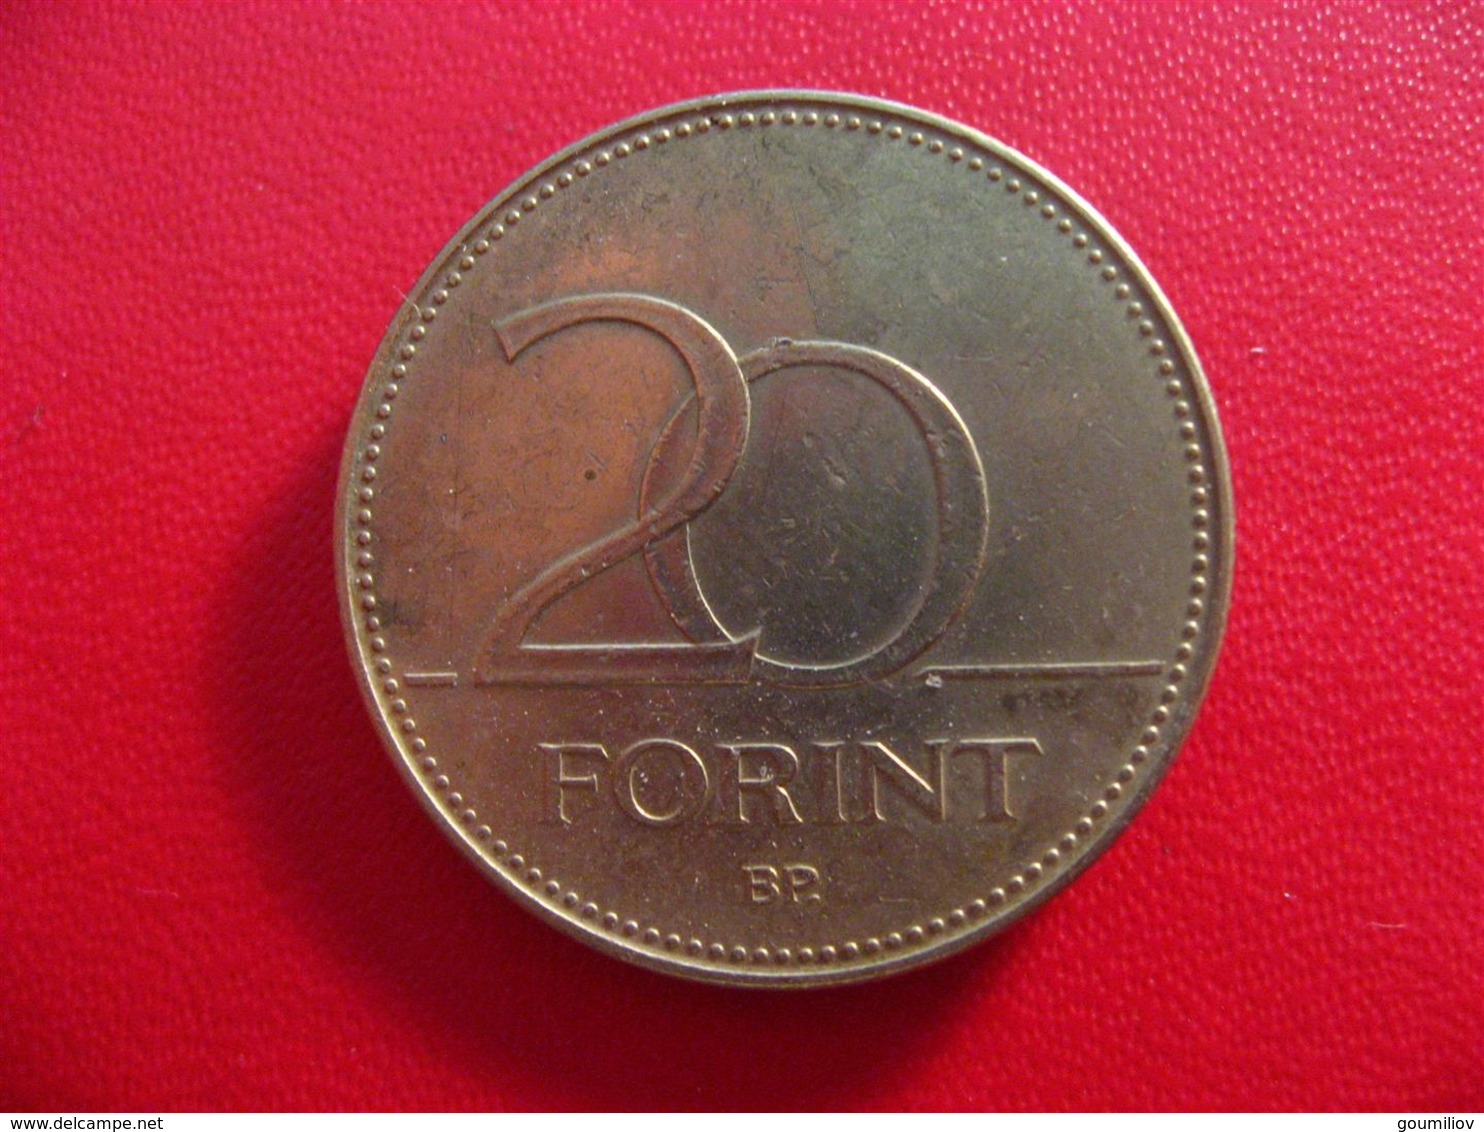 Hongrie - 20 Forint 1994 7505 - Hungary